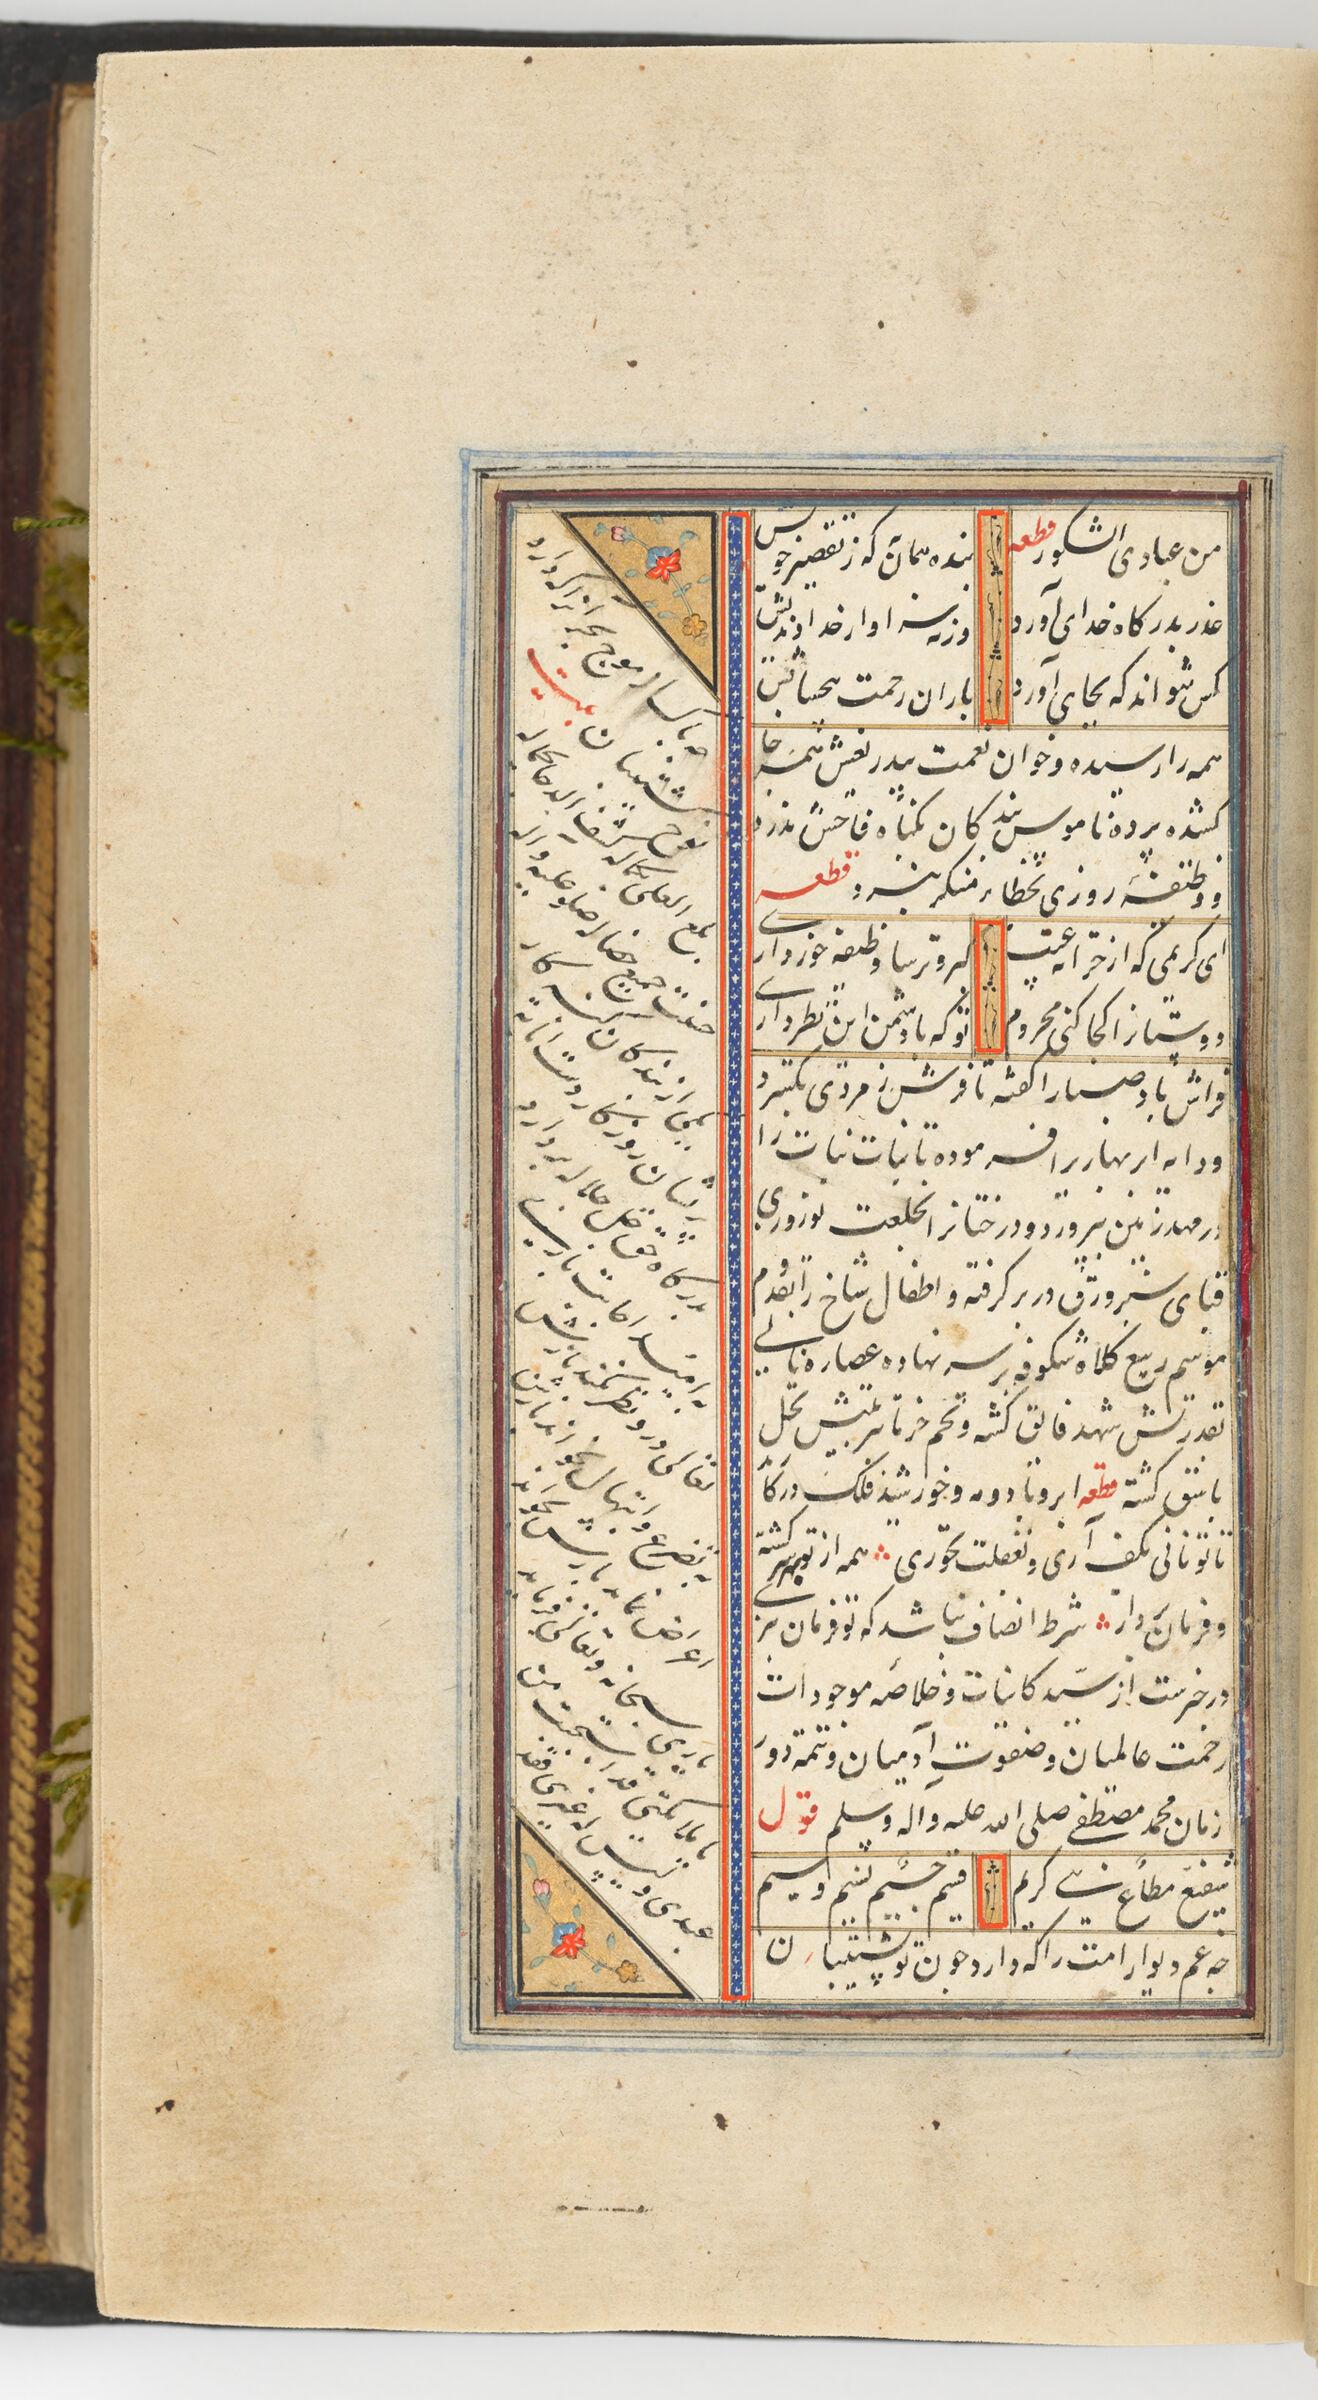 Text Folio (Text Recto; Text Verso Of Folio 34), From A Manuscript Of The Kulliyat Of Sa'di